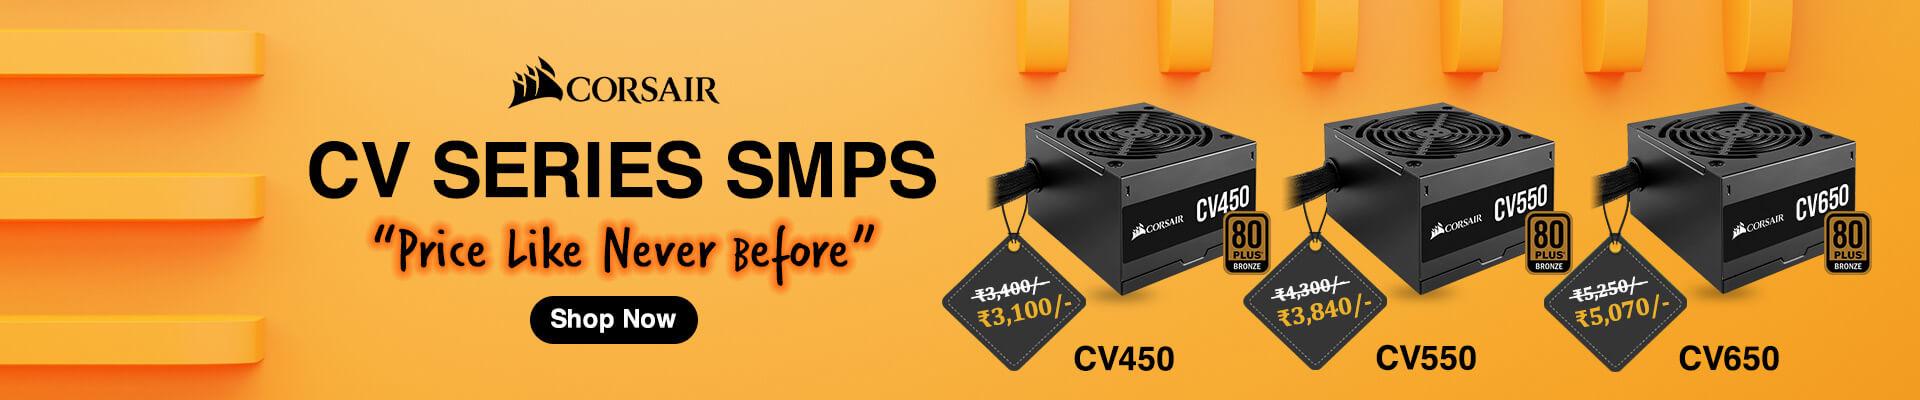 Corsair CV Series SMPS